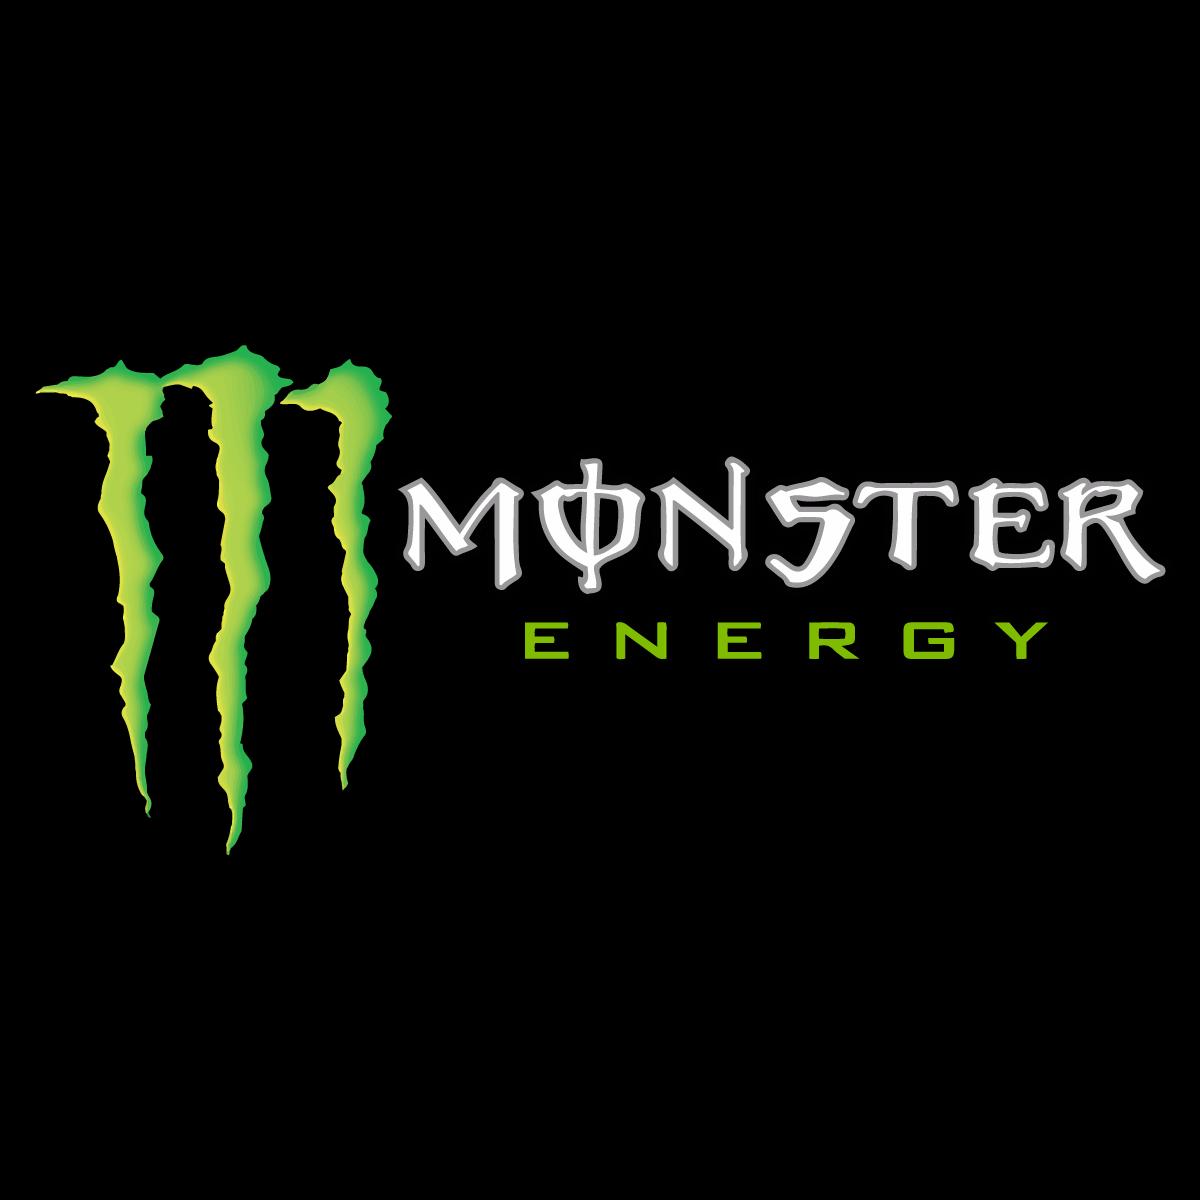 Black And Monster Energy Logo Logodix